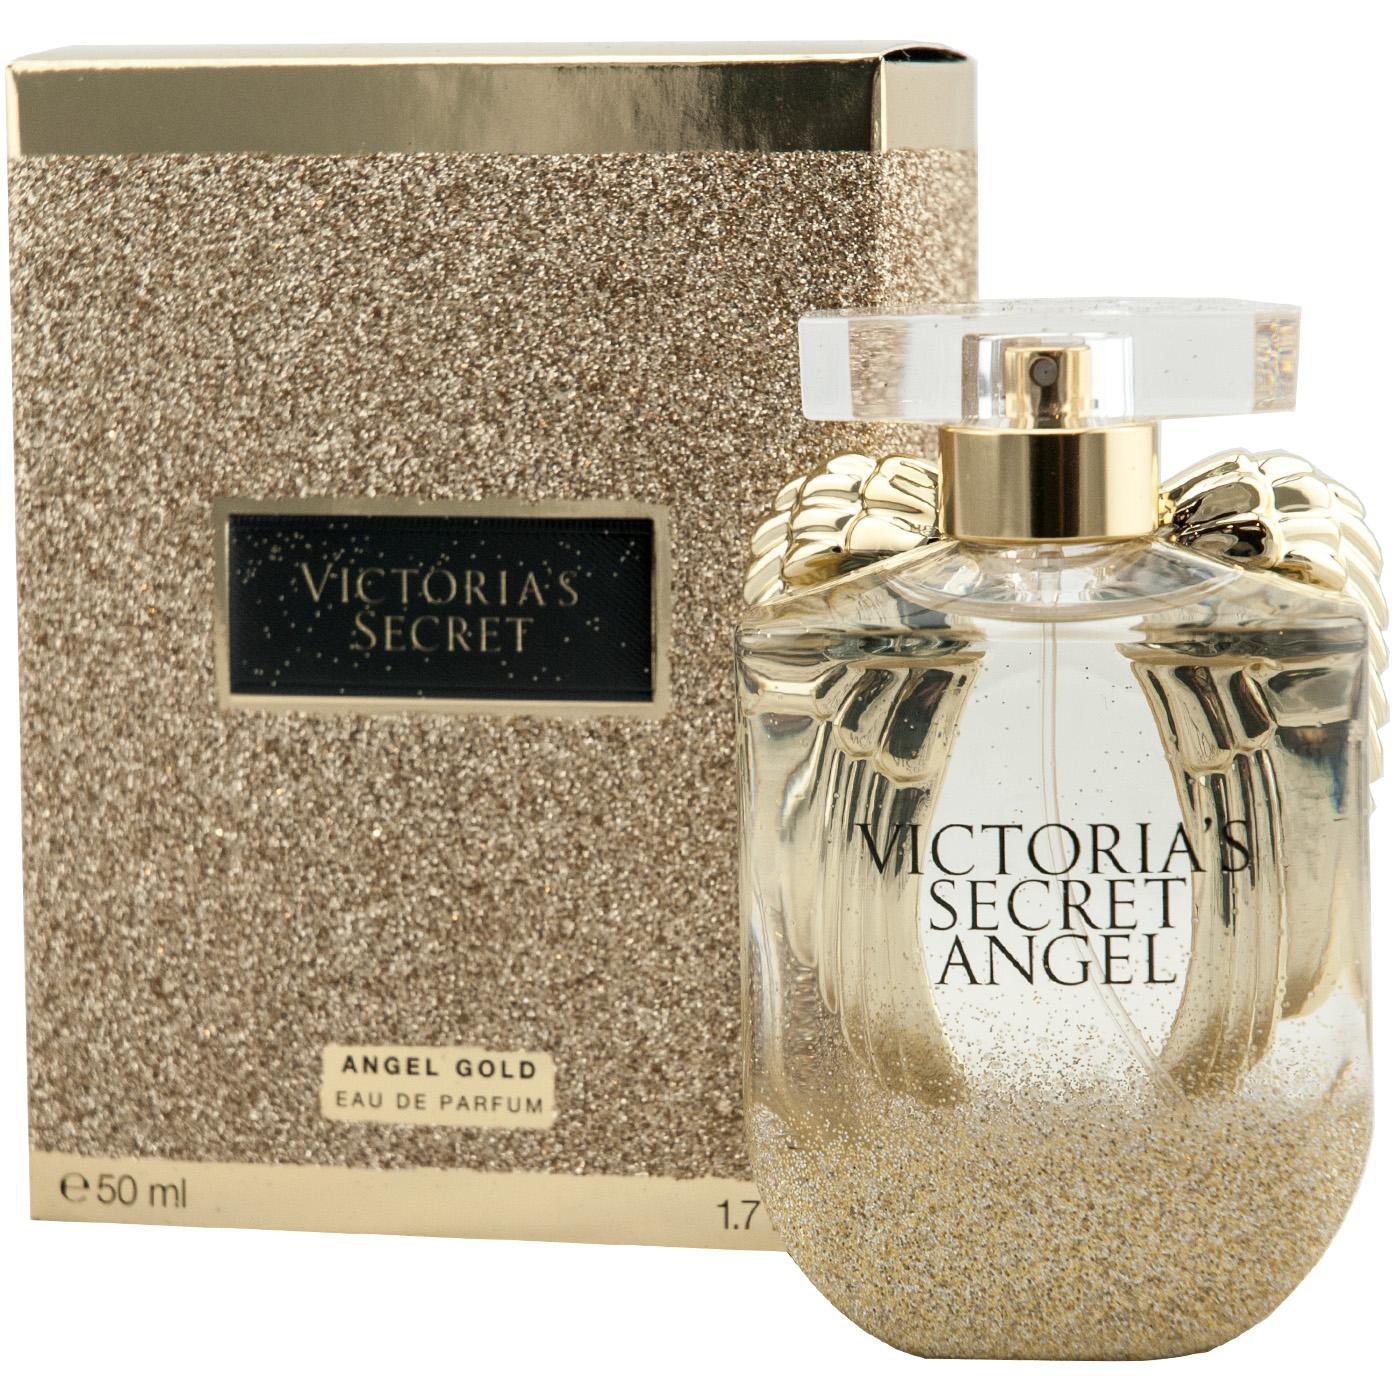 b392aea1a9 Victorias Secret Angel Golden 50ml Eau de Parfum Edp Spray for Woman ...